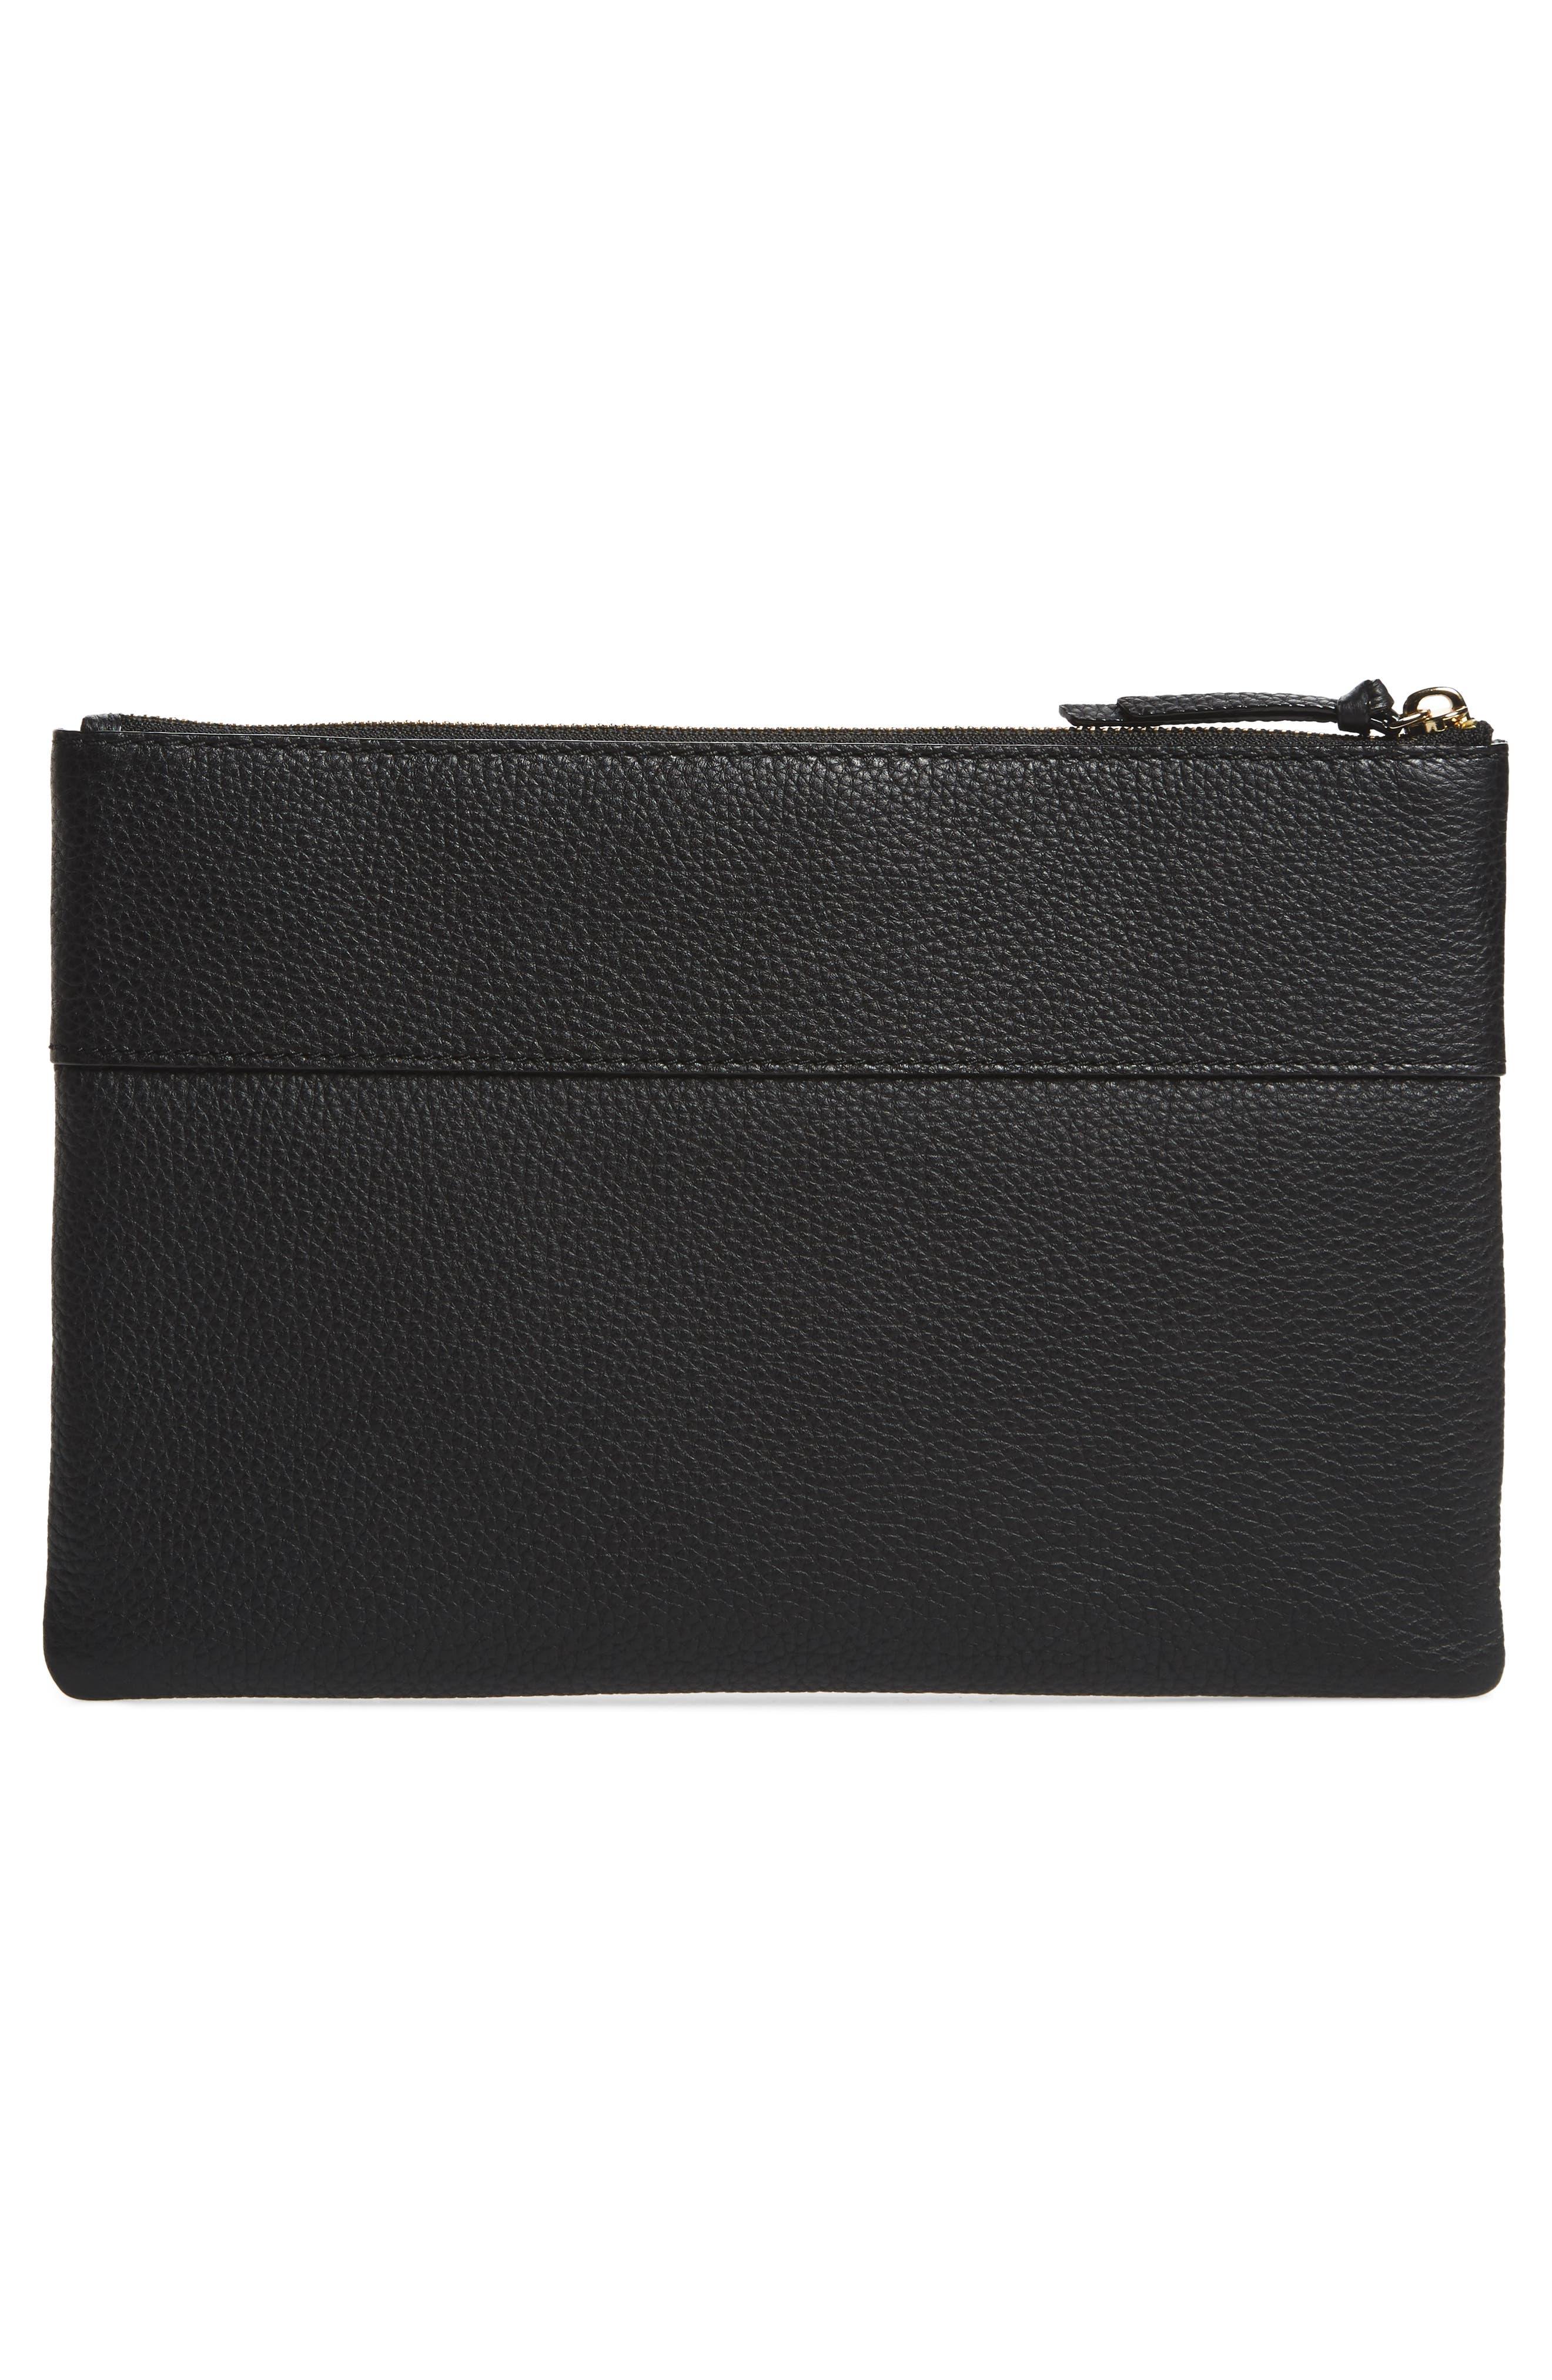 jackson street large mila leather pouch,                             Alternate thumbnail 3, color,                             Black